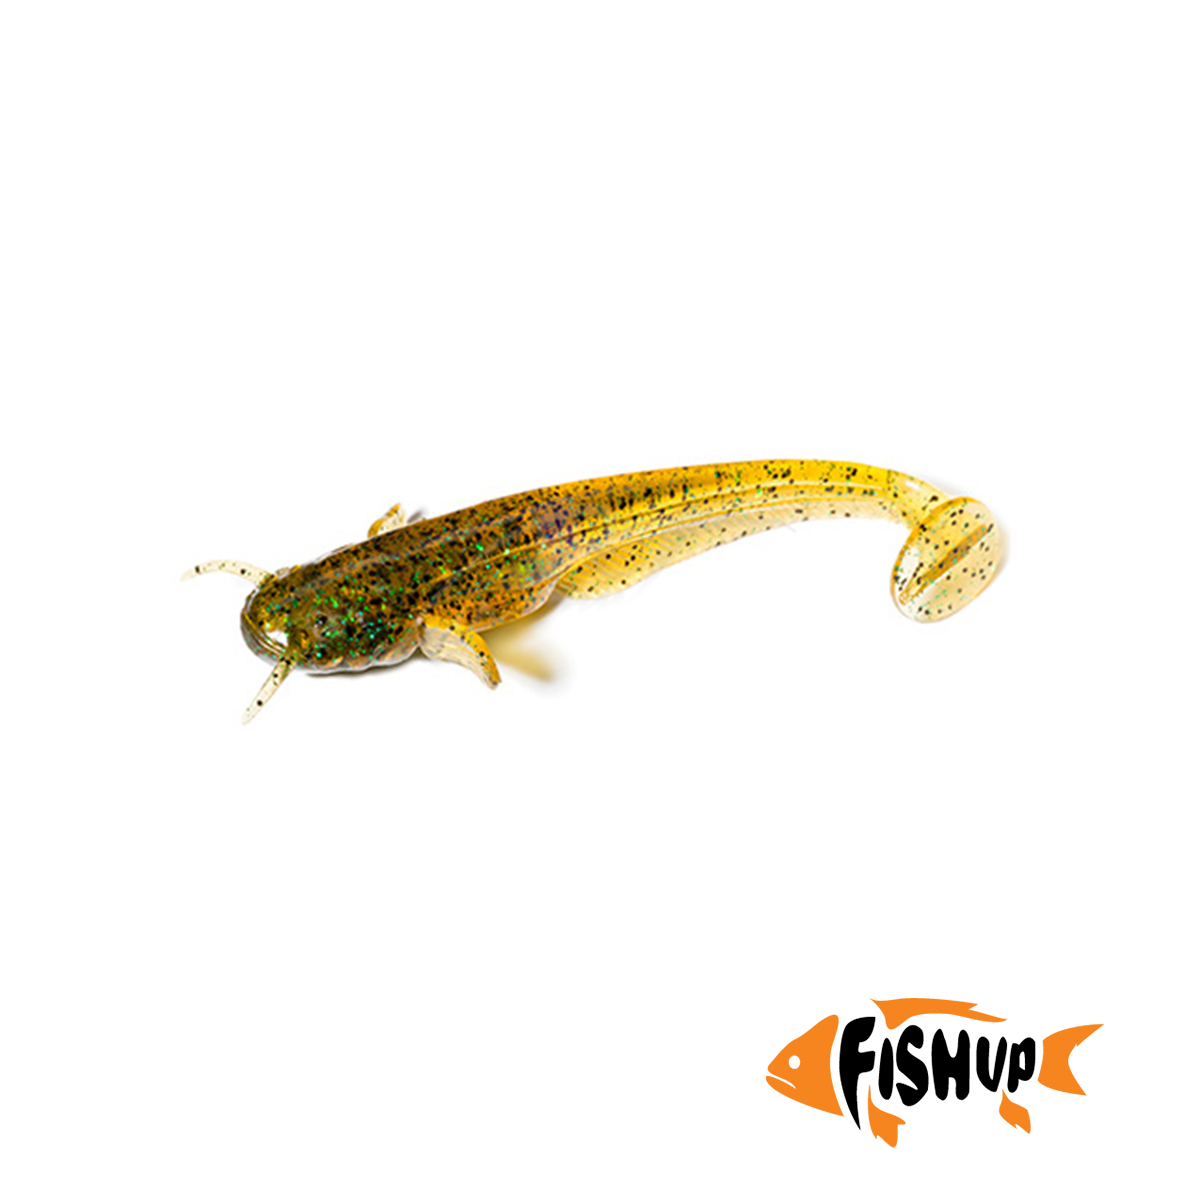 "Catfish 3"" (8шт), #036 - Caramel/Green & Black"